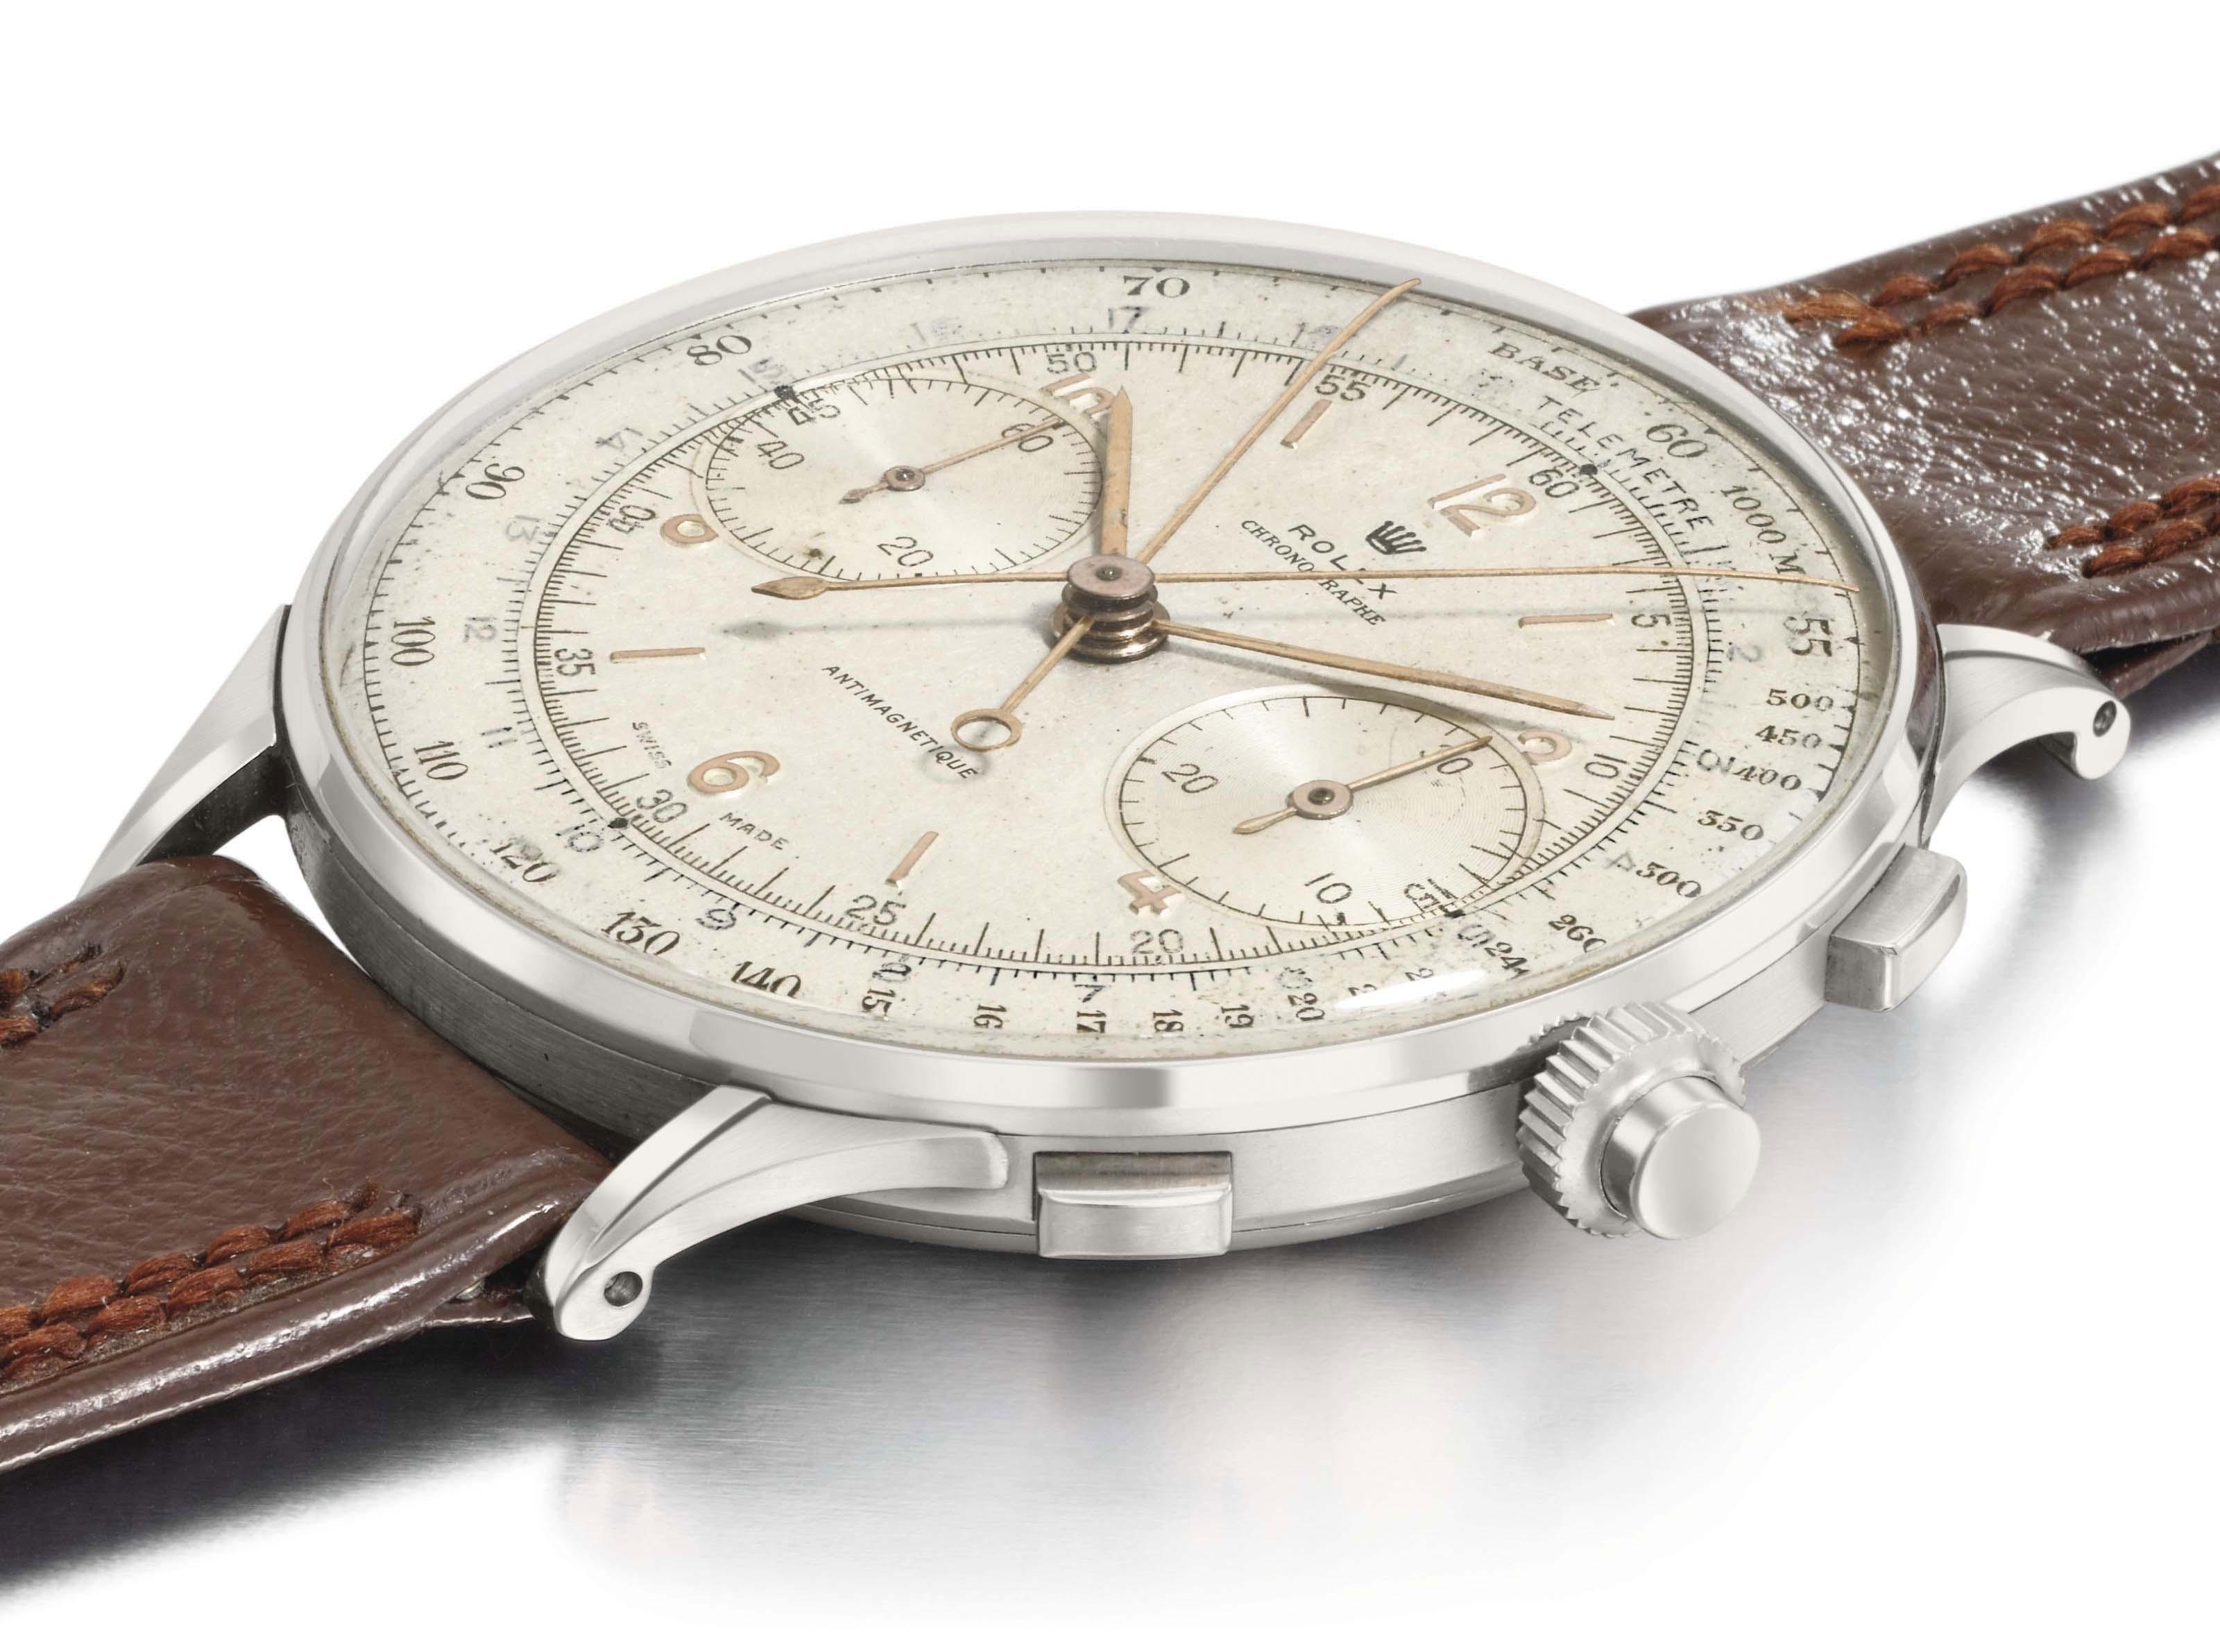 Rolex. An extraordinarily rare, oversized stainless steel split seconds chronograph wristwatch